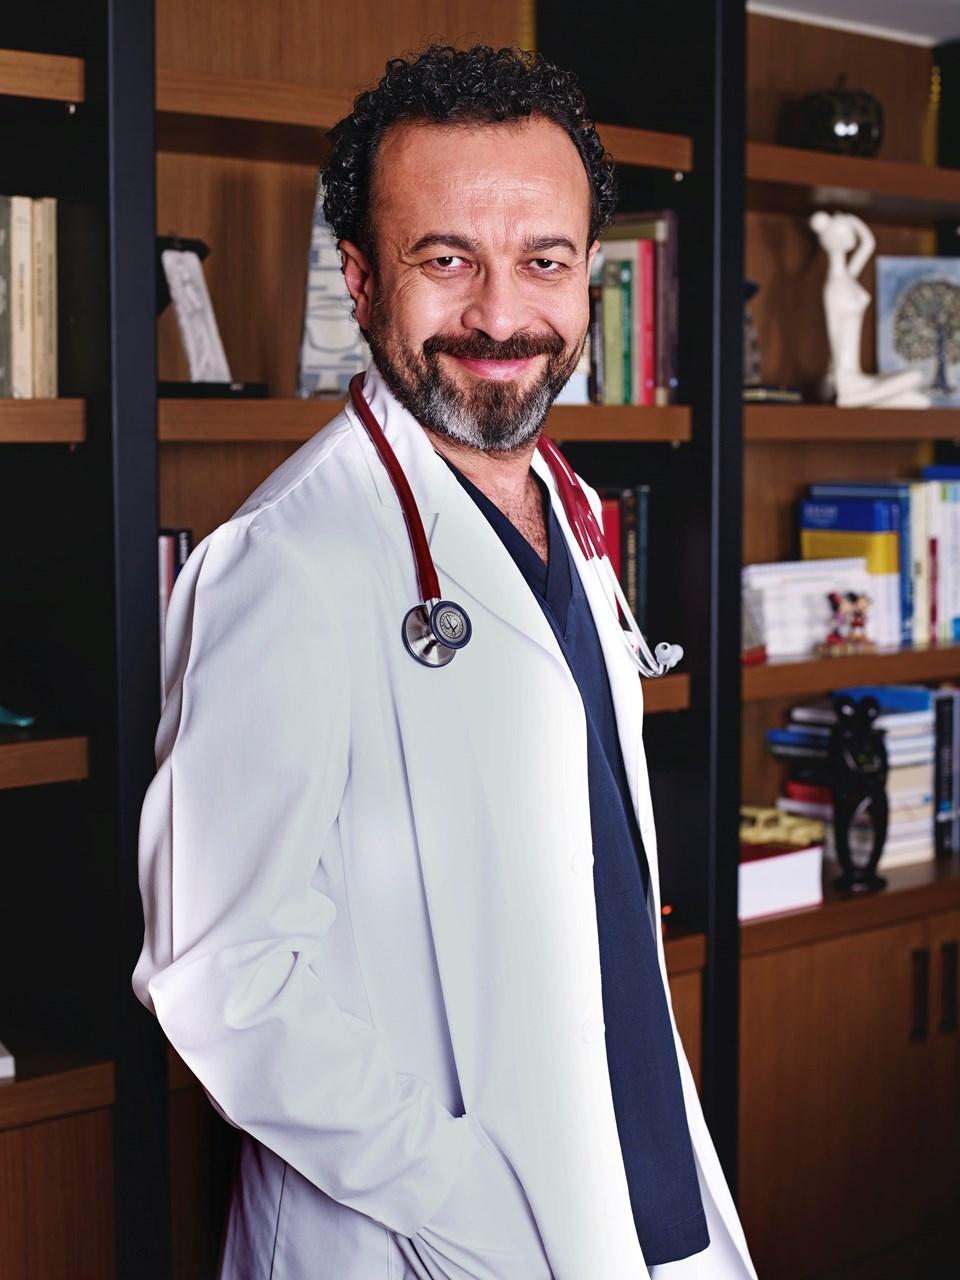 Doktor Ümit Aktaş